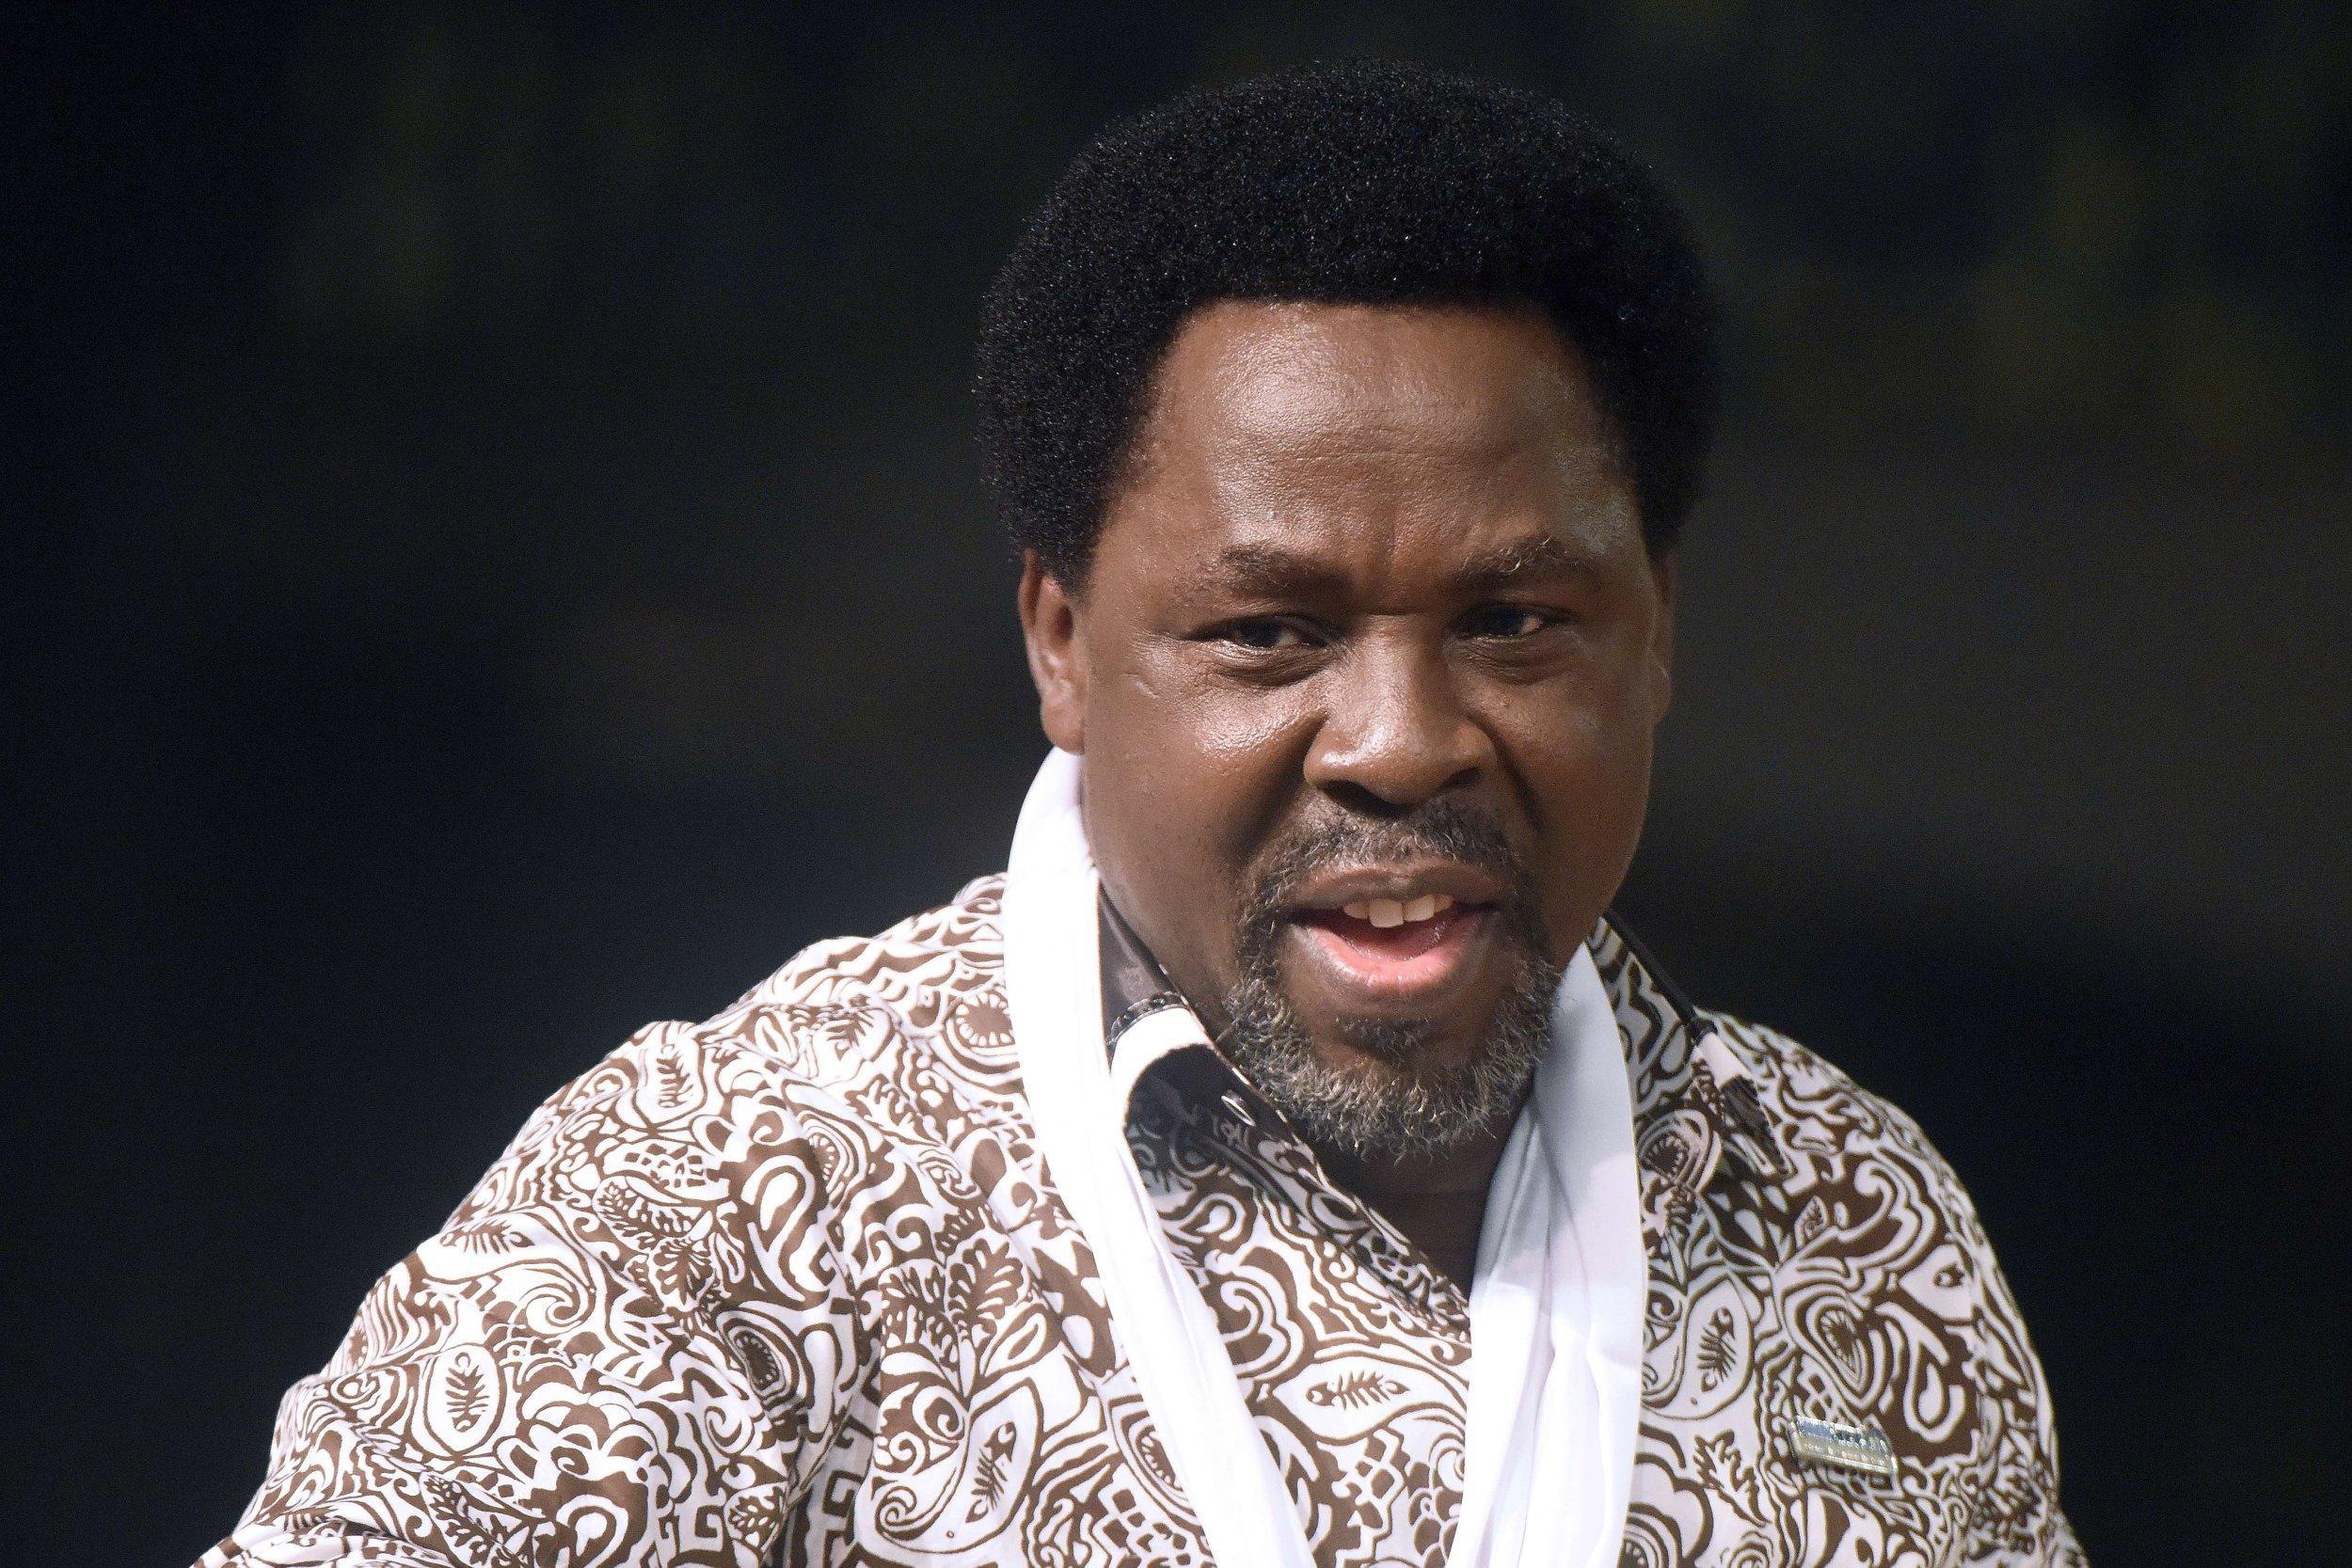 Nigerian preacher TB Joshua speaks at a service in Lagos.